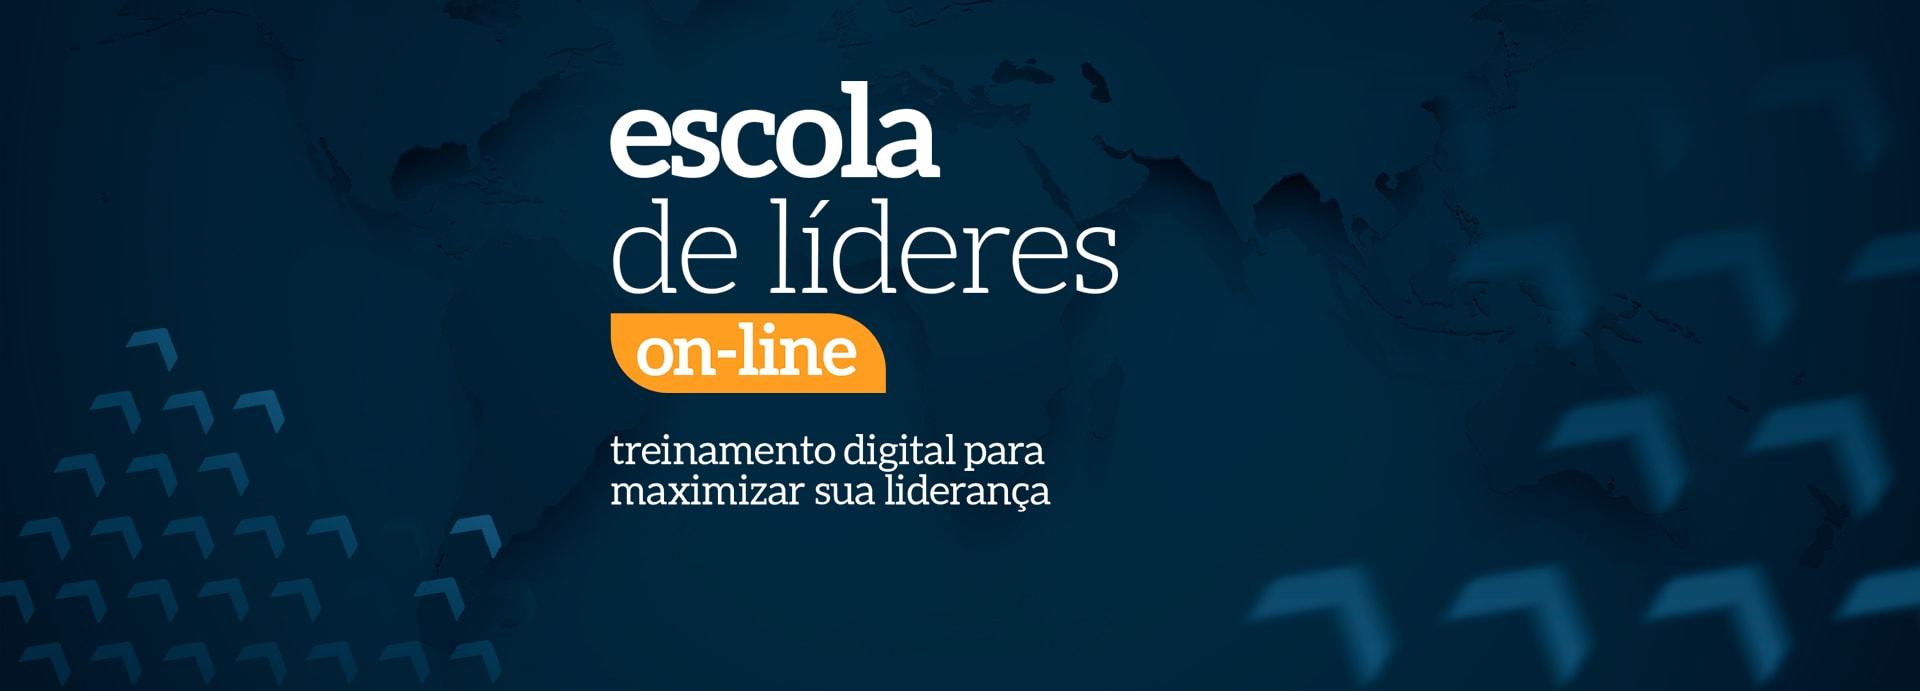 Escola de Líderes On-line